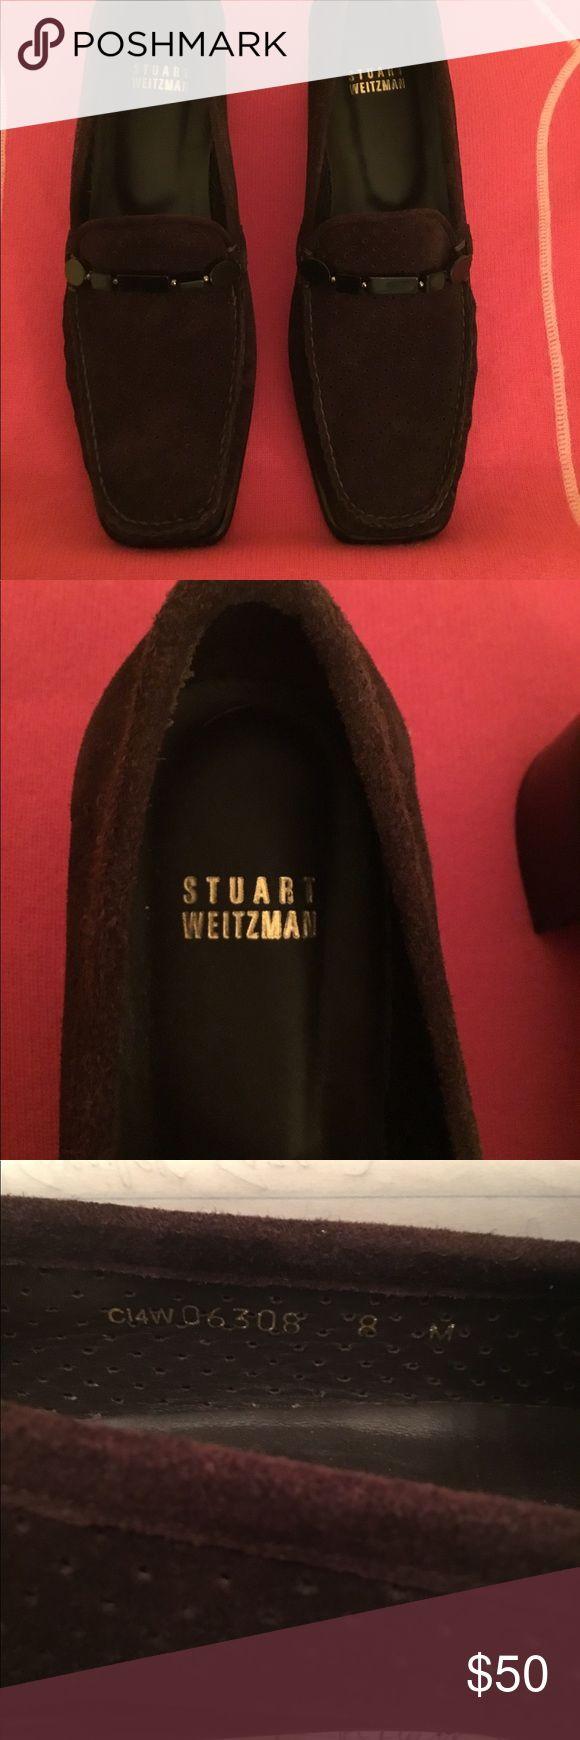 New Stuart Weizmann Brown Suede Loafers NWOT Stuart Weitzman Brown Suede Loafers. 1/2 inch Block Heel. Size 8 Stuart Weitzman Shoes Flats & Loafers